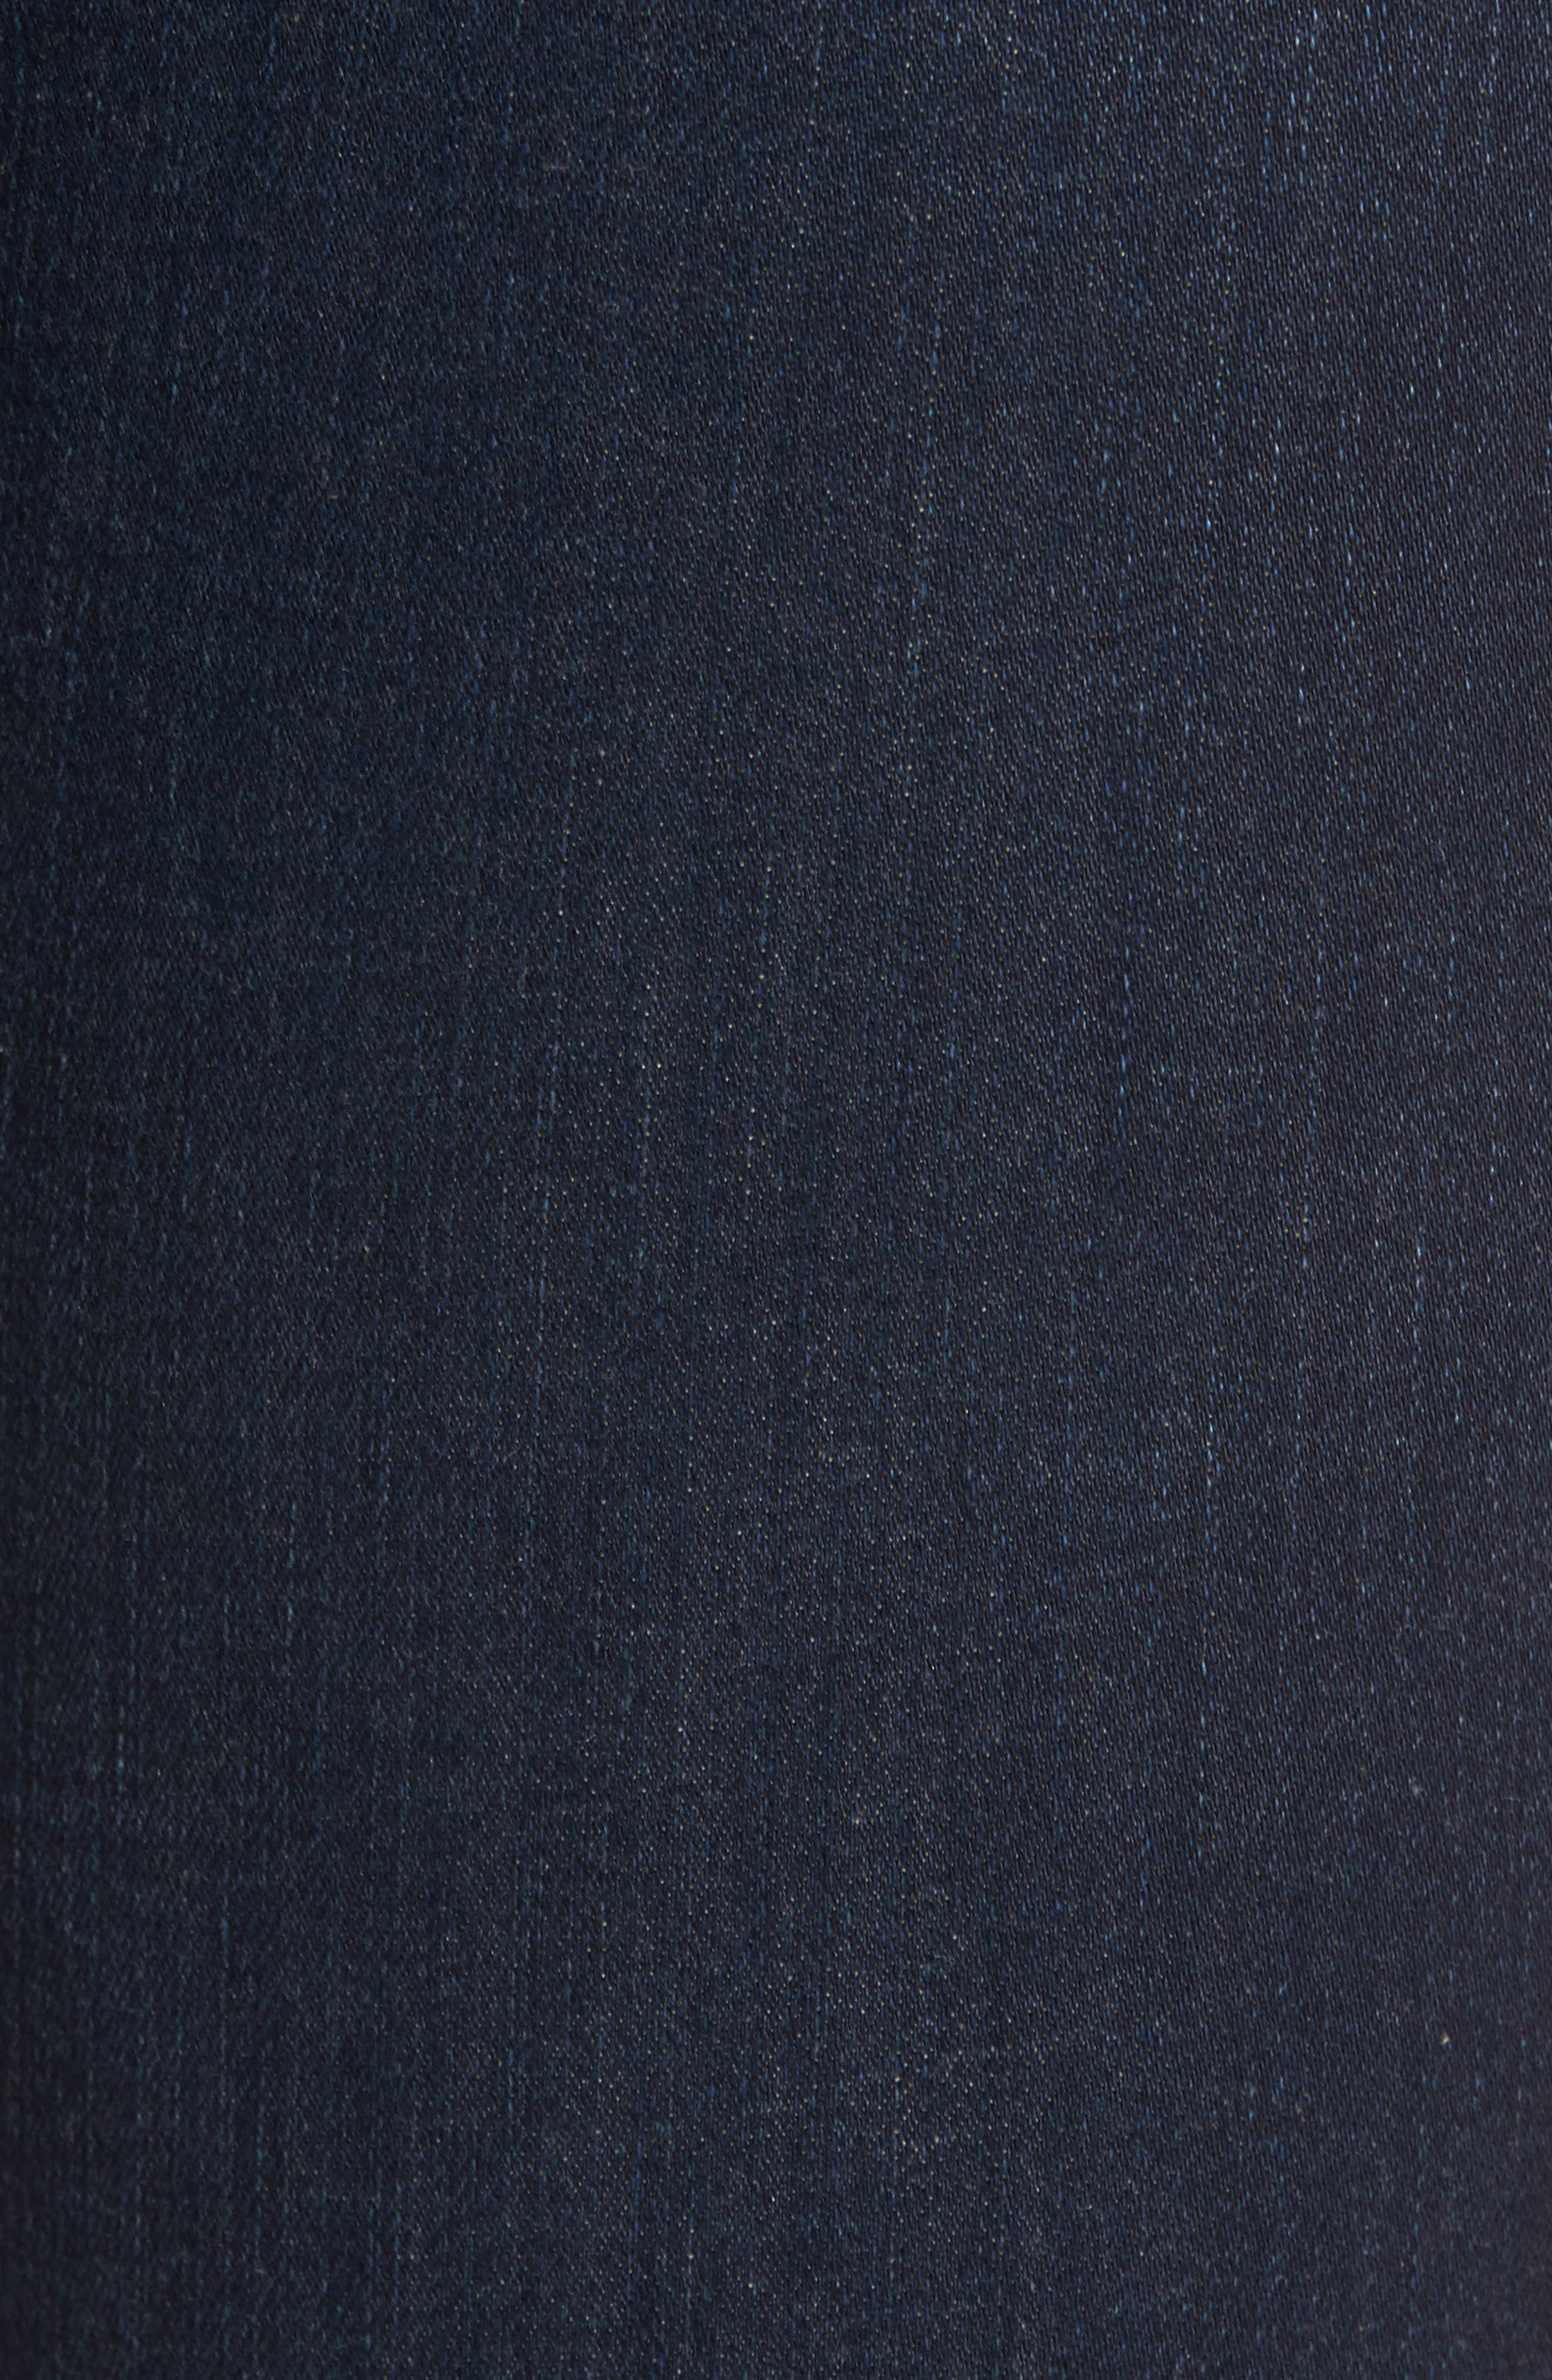 Chrissy High Waist Ankle Skinny Jeans,                             Alternate thumbnail 5, color,                             405